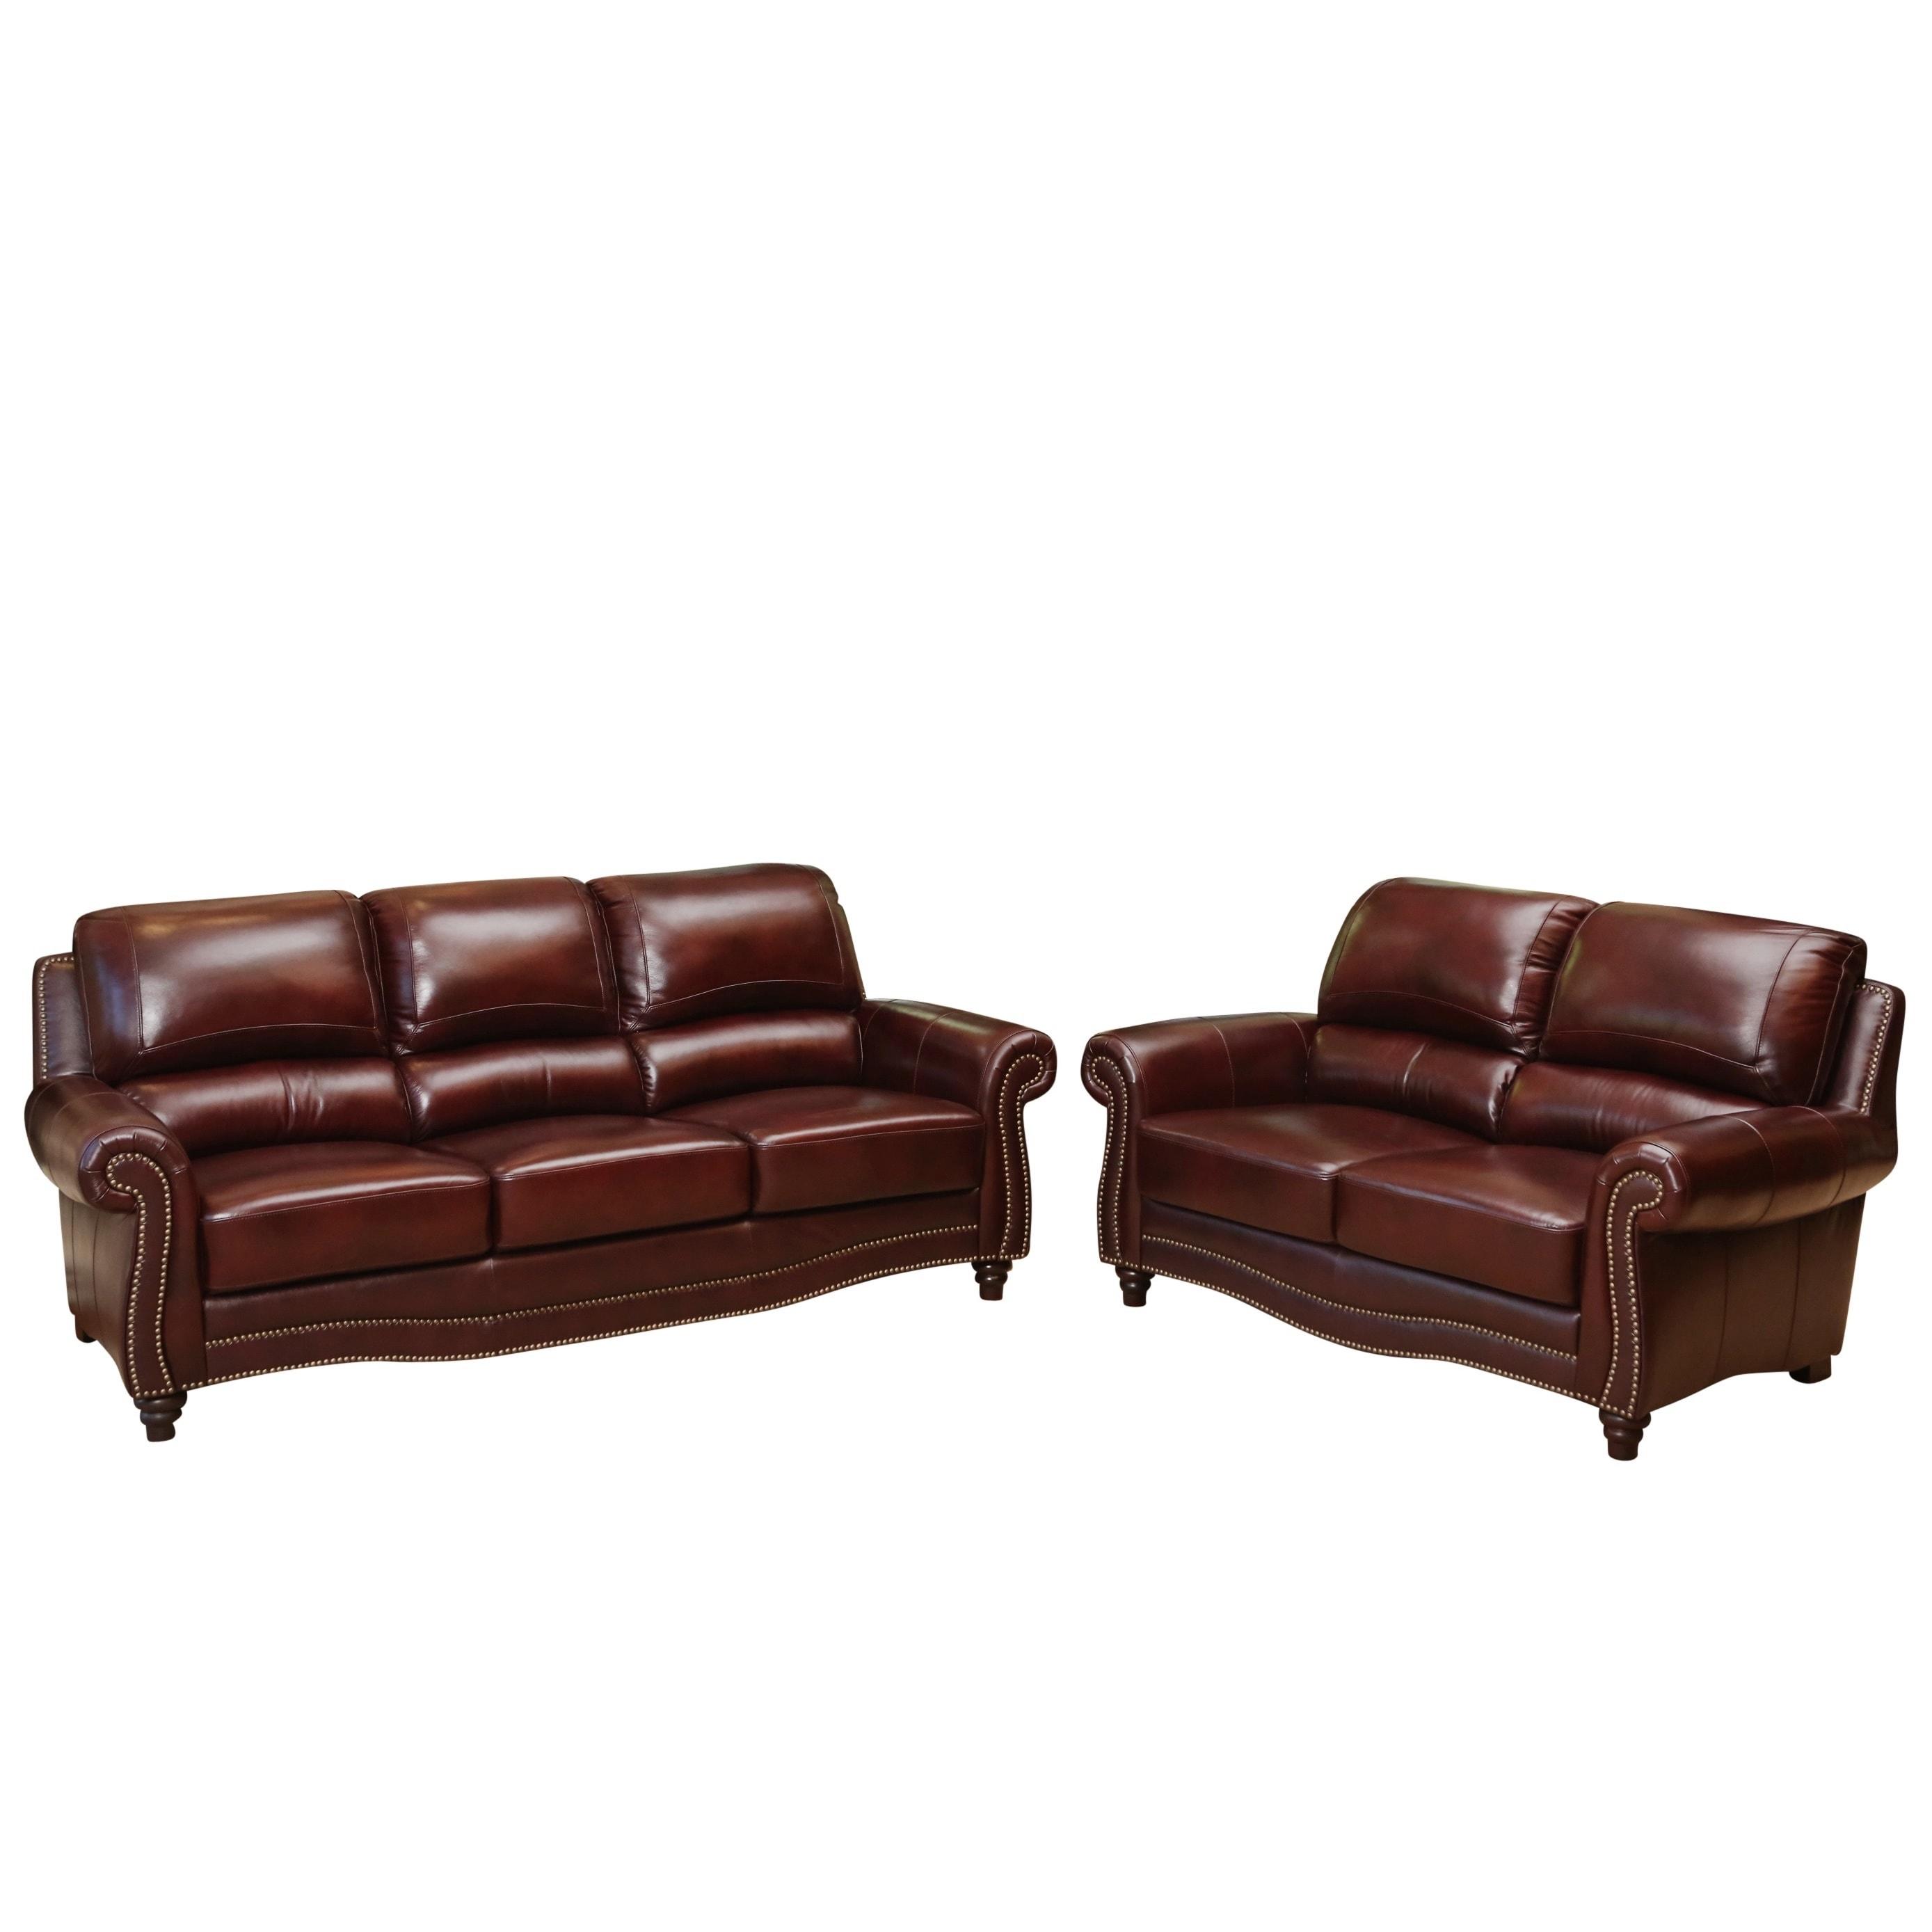 Abbyson barkley top grain burgundy leather sofa and loveseat